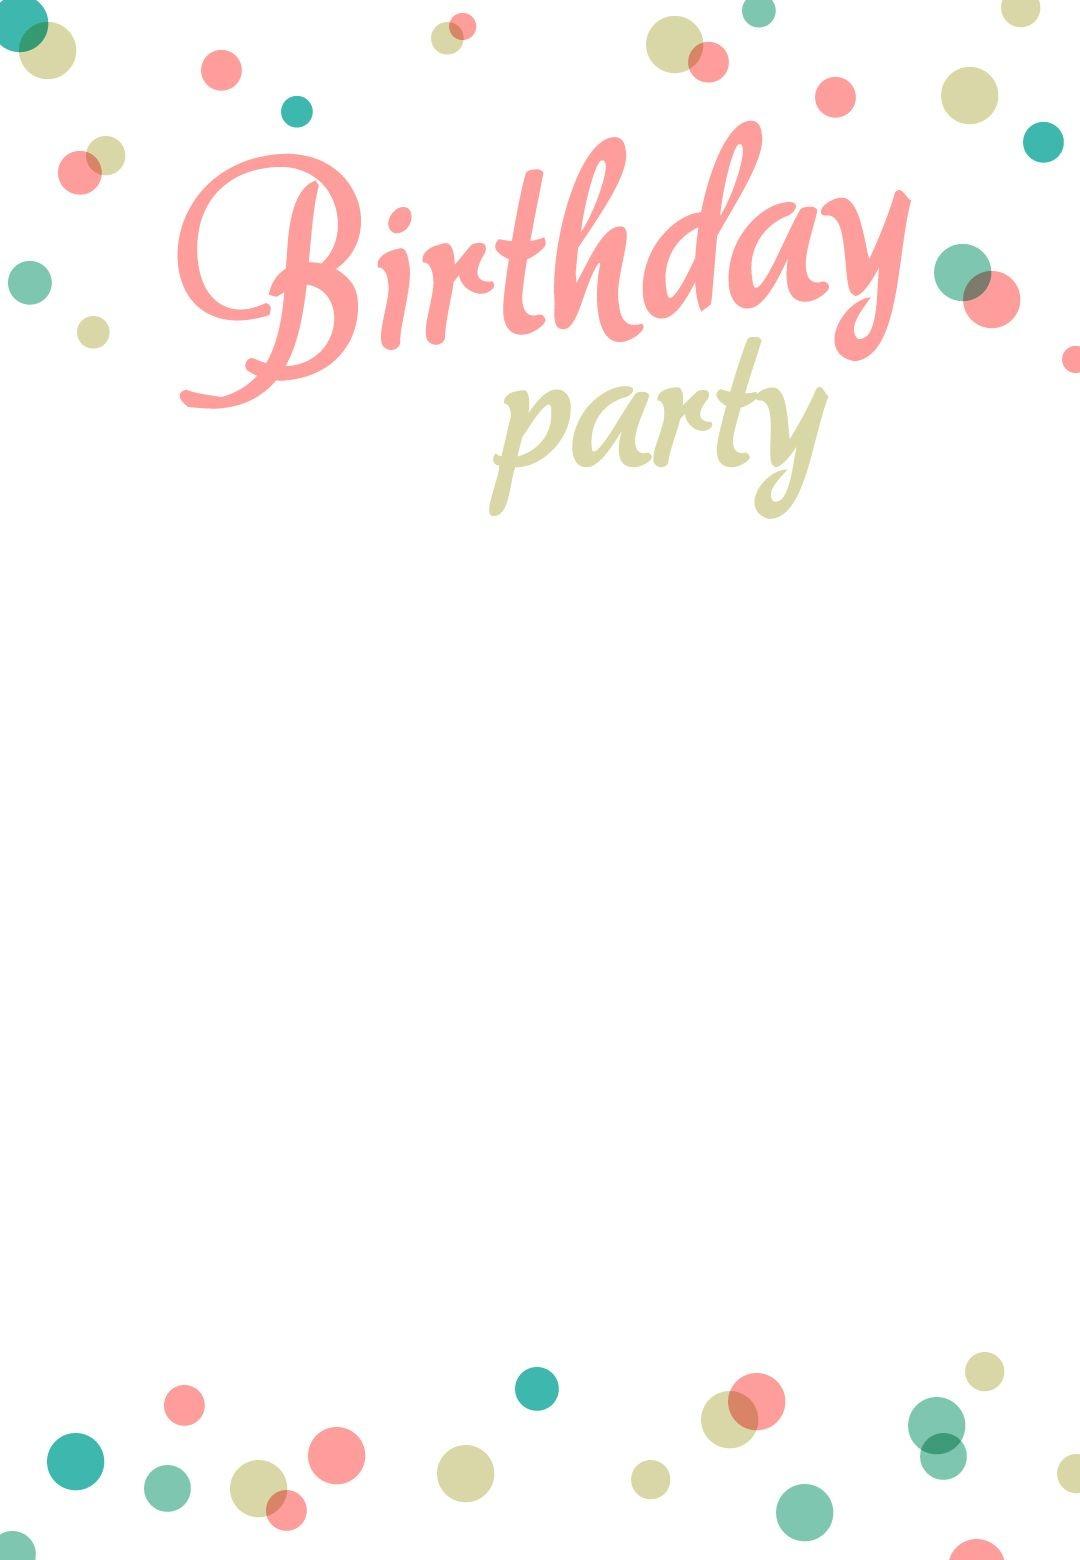 Birthday Party #invitation Free Printable | Invitations | Pinterest - Free Printable Birthday Invitations Pinterest